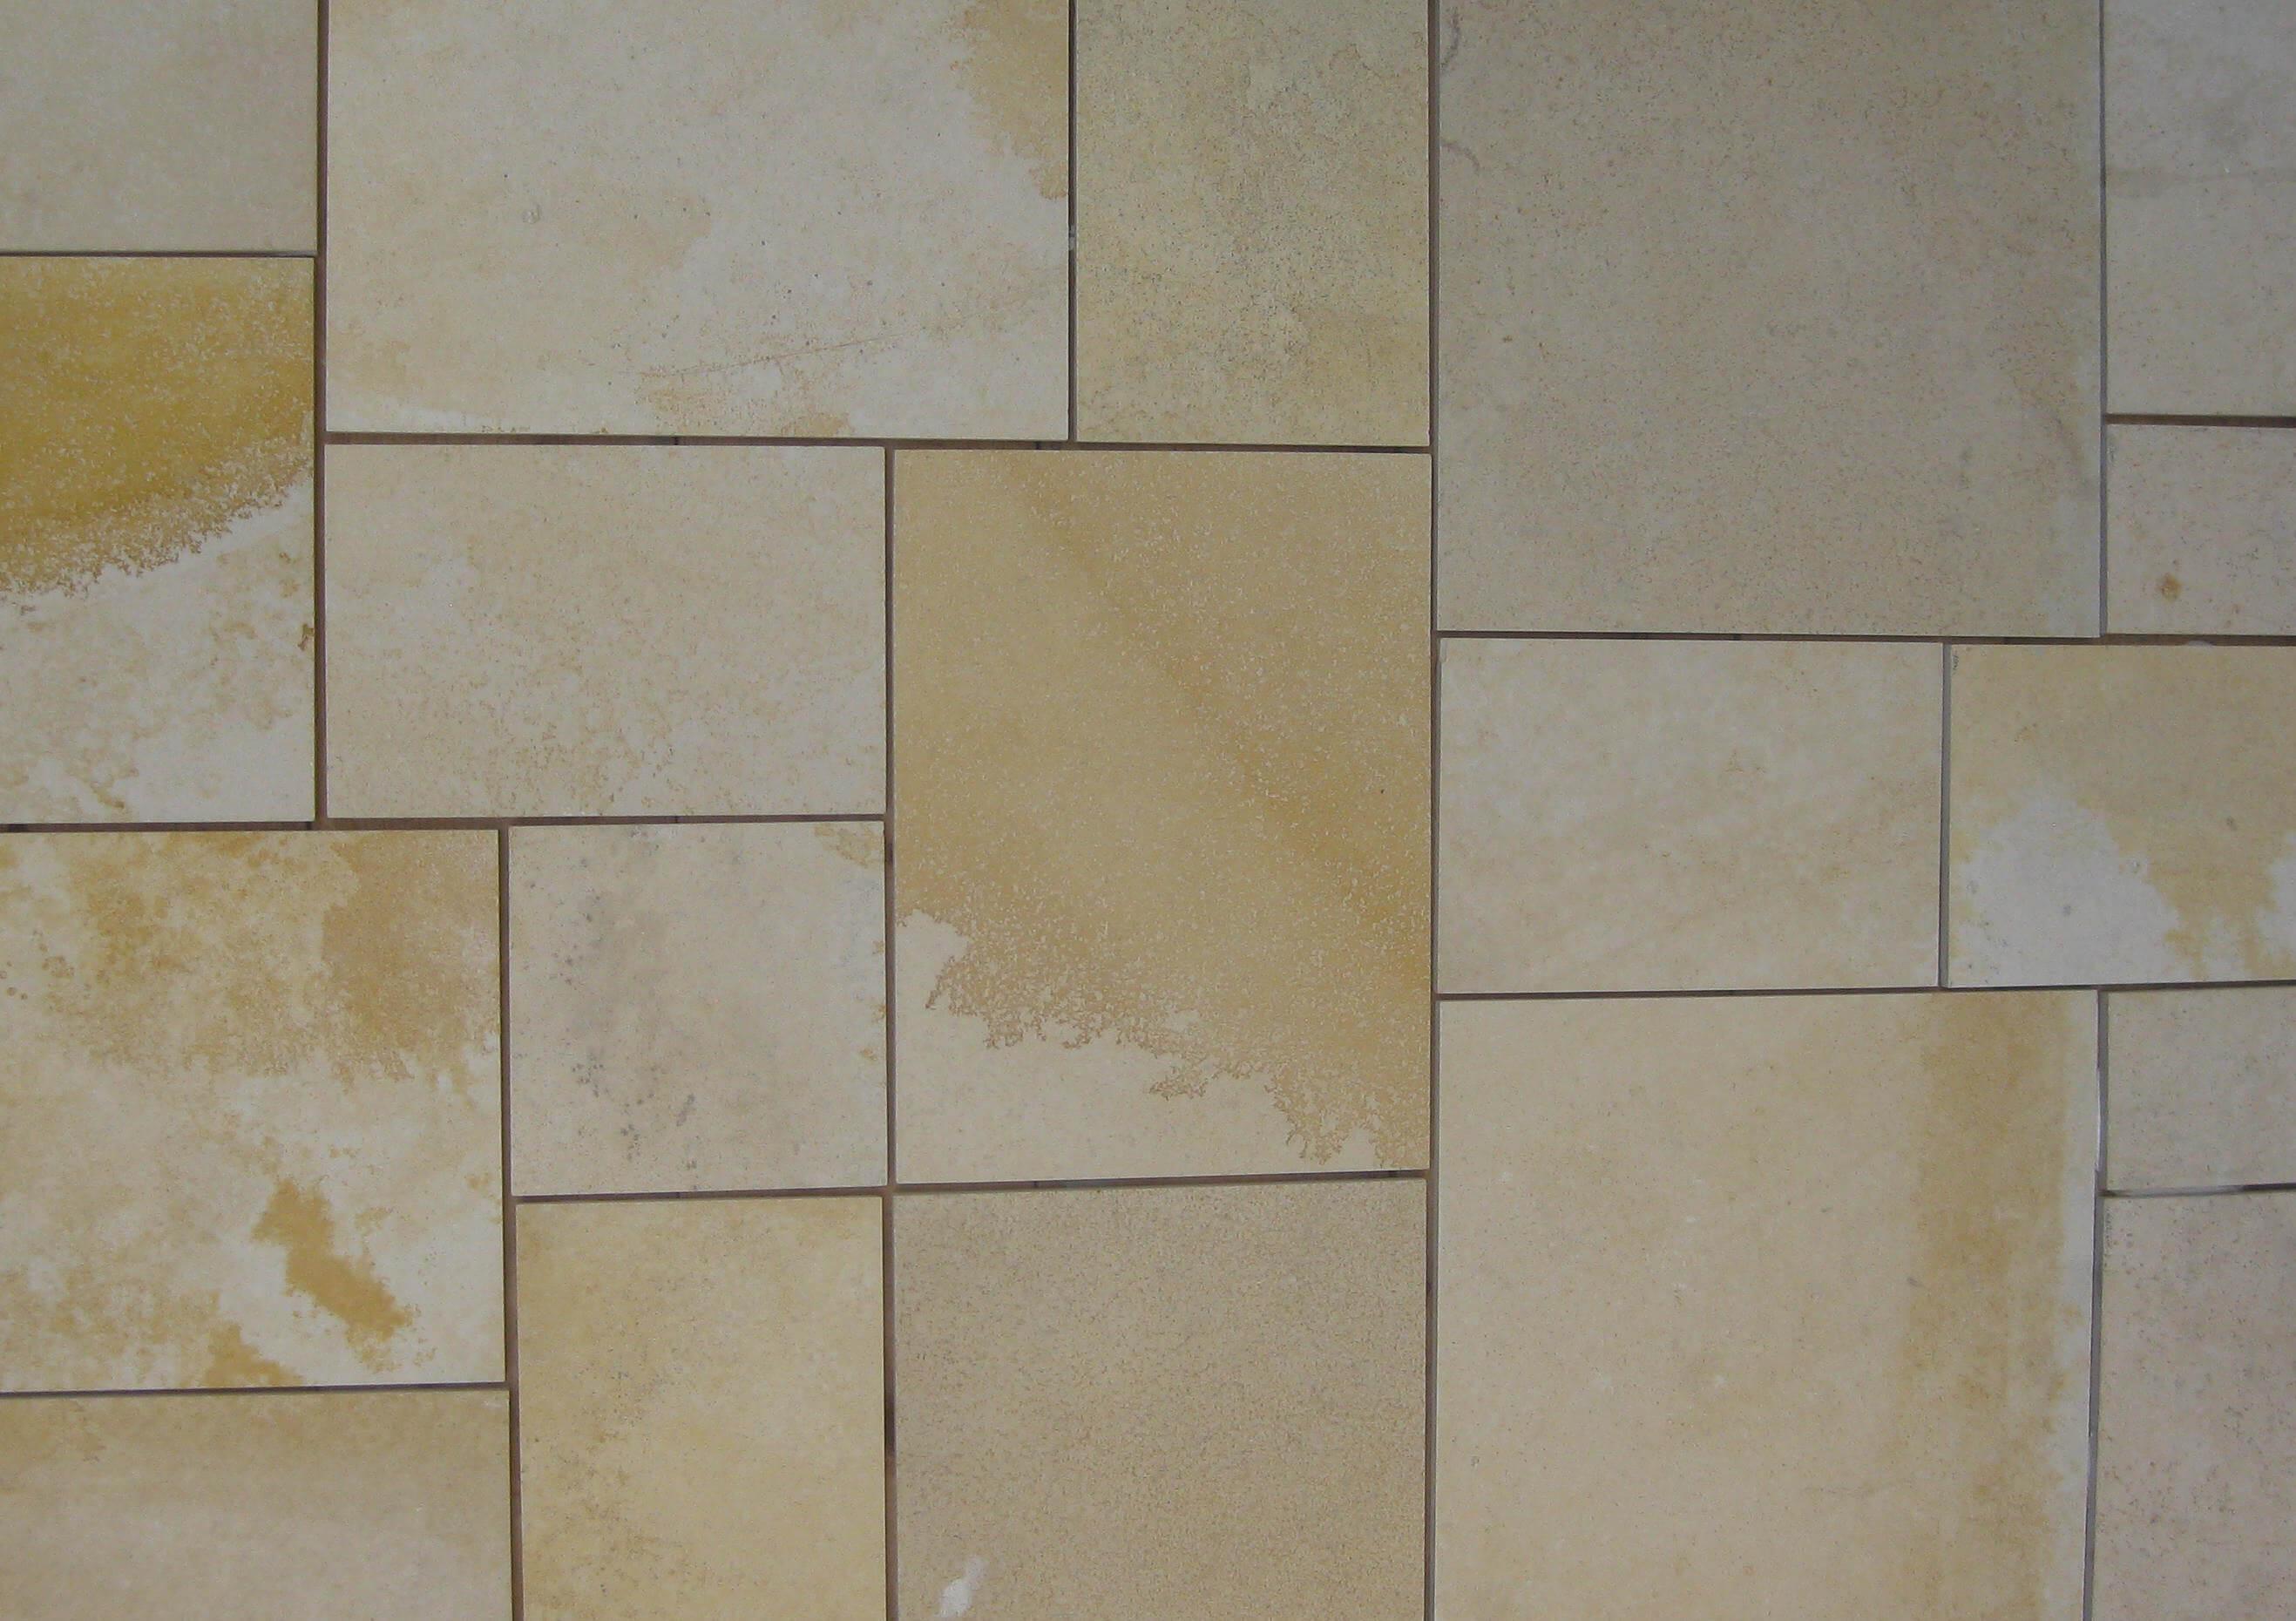 solnhofener platten im badezimmer, solnhofener platten « jura marmor, Innenarchitektur